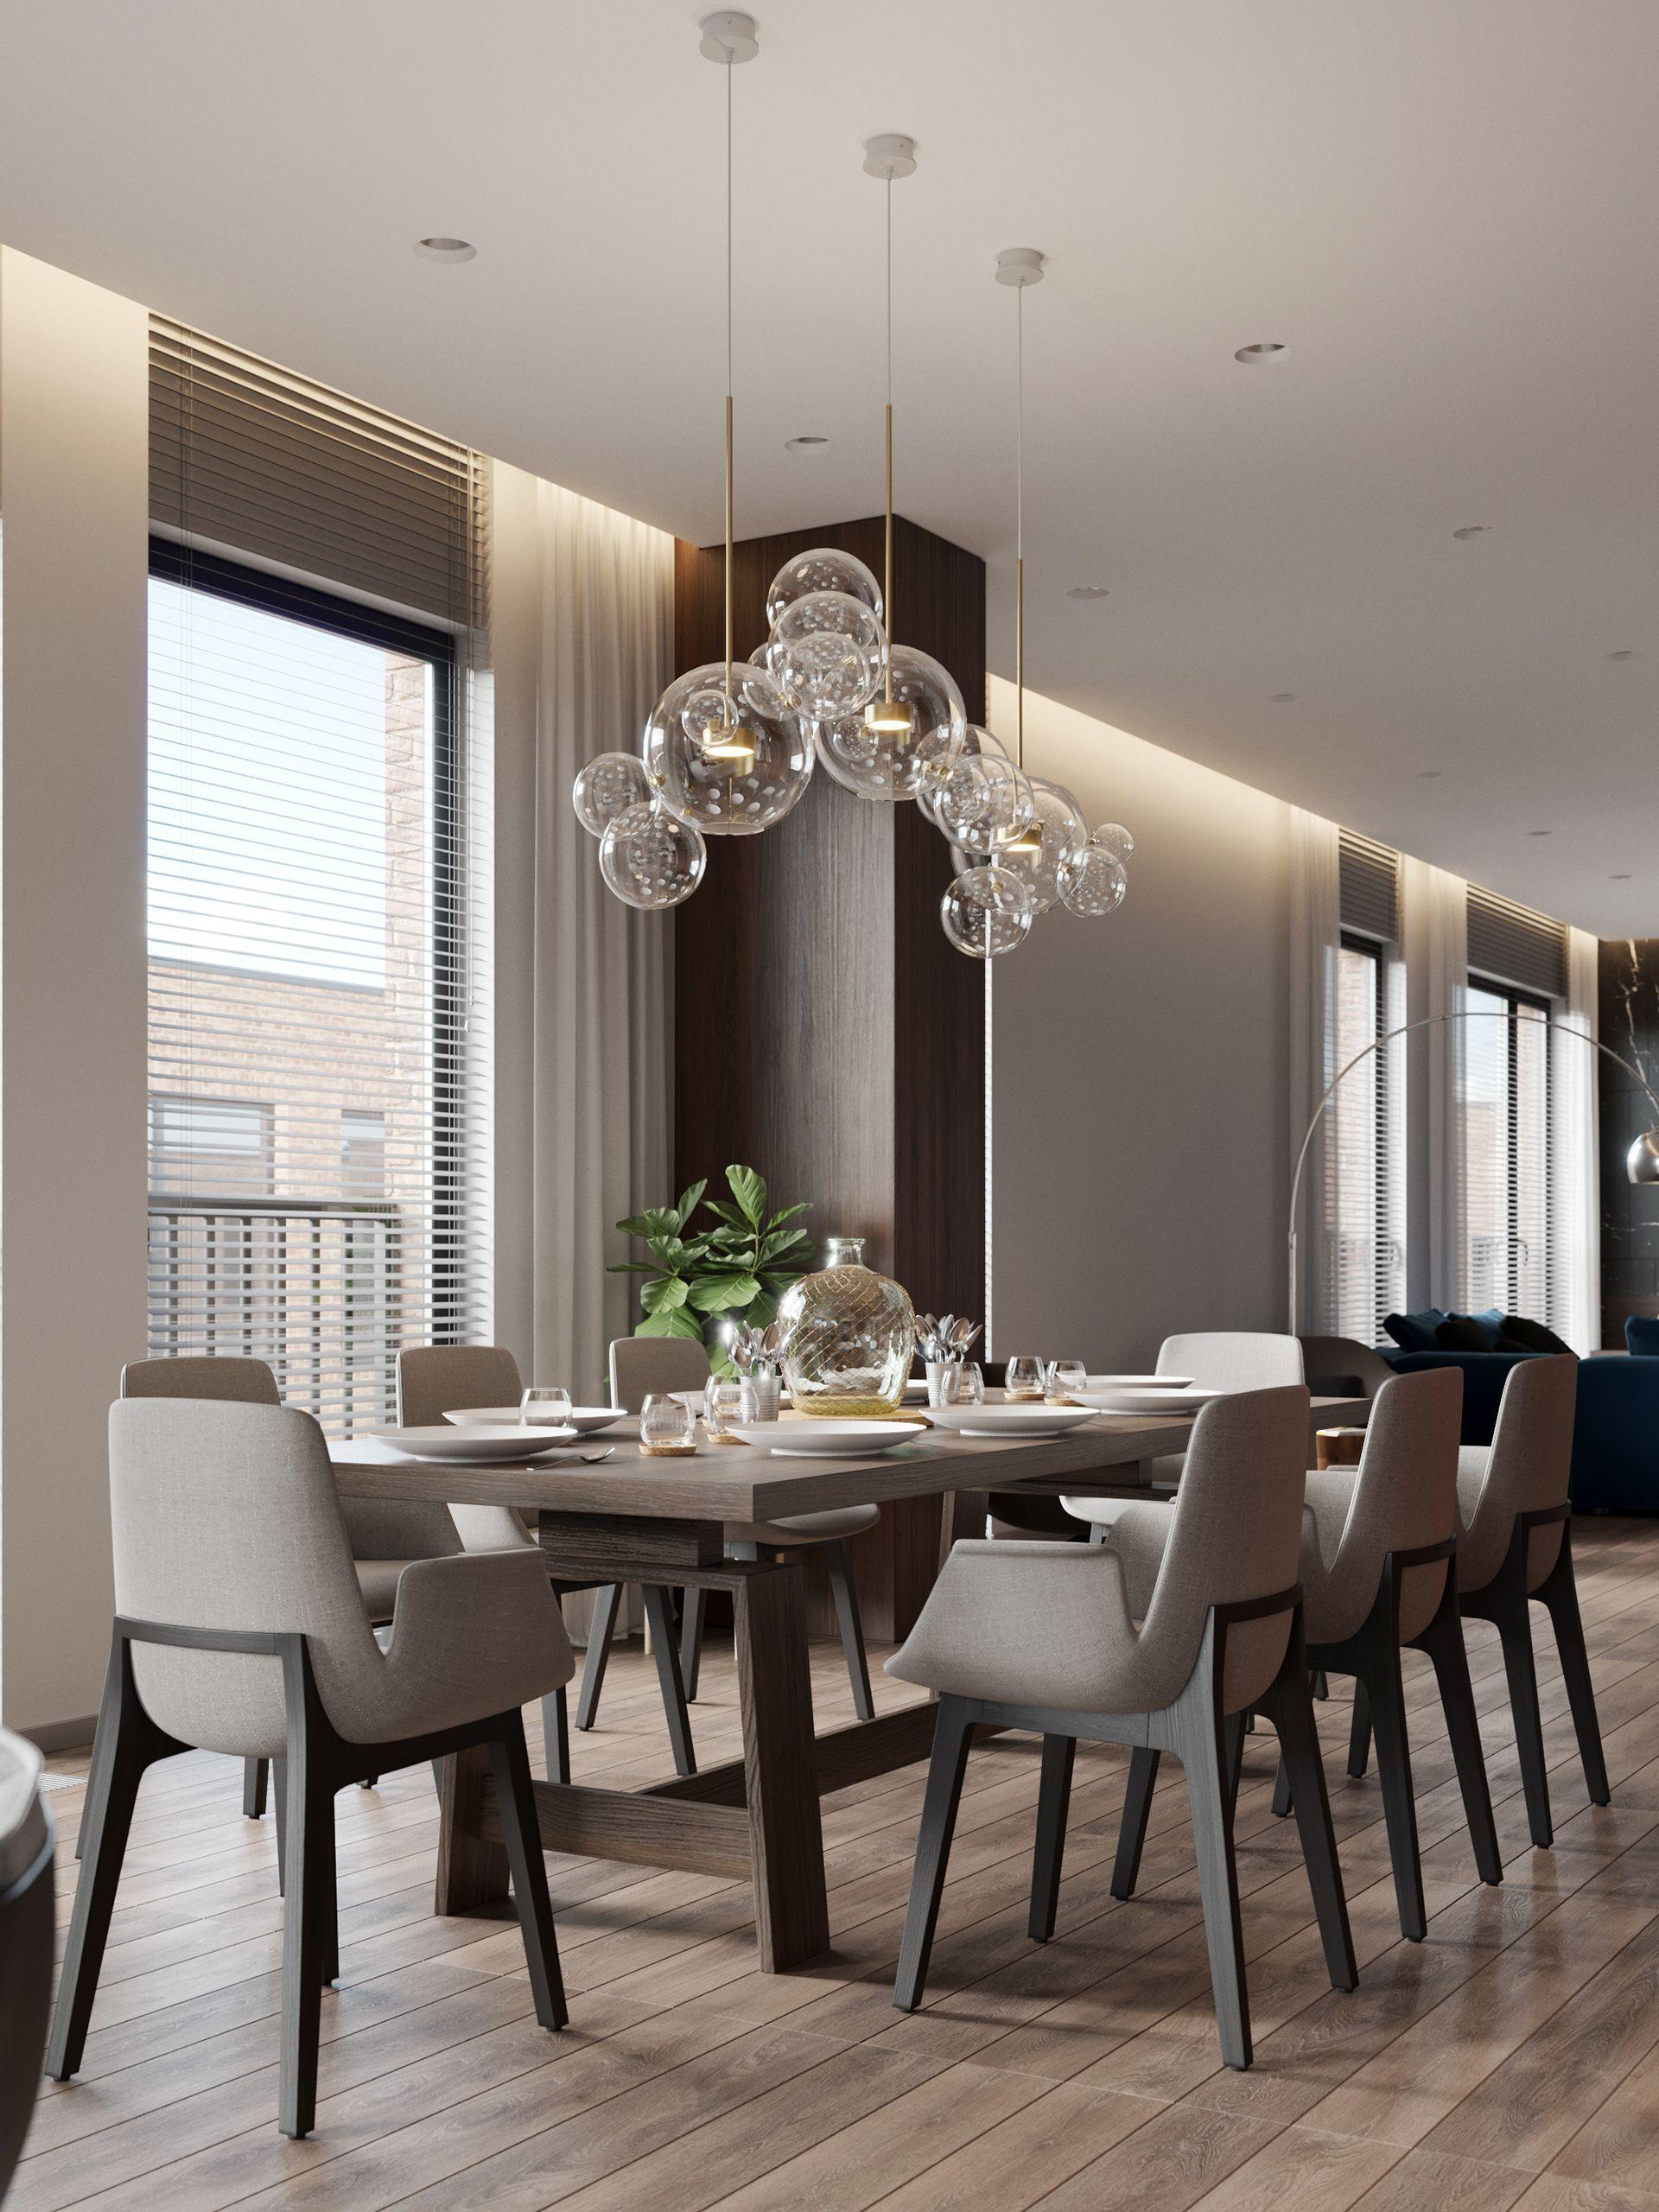 50 Best Modern Dining Room Design Ideas Farmtable Dining Room Dining Room Design Ideas Desig Dining Room Design Modern Dinning Room Design Luxury Dining Room